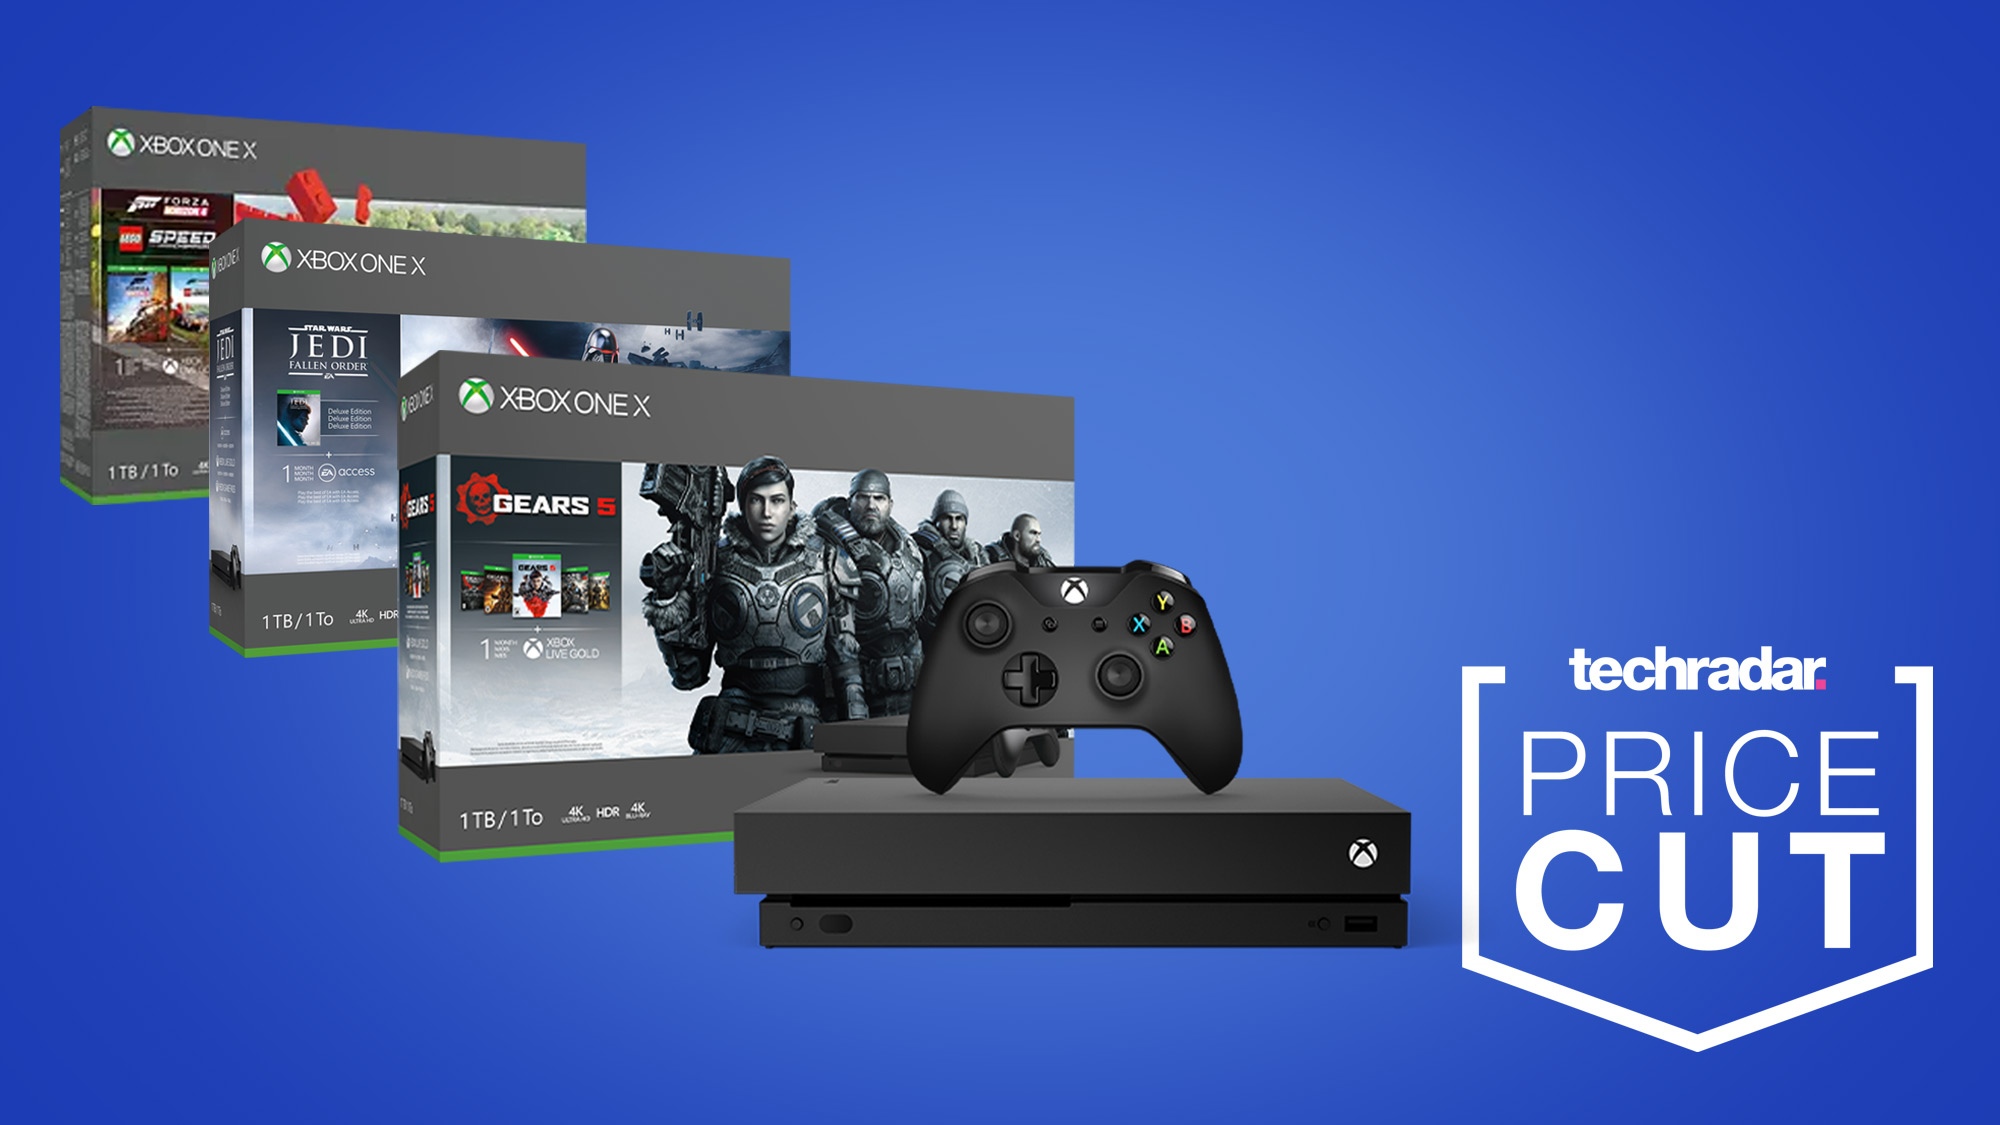 Xbox One X prices take massive cut in latest Microsoft sales